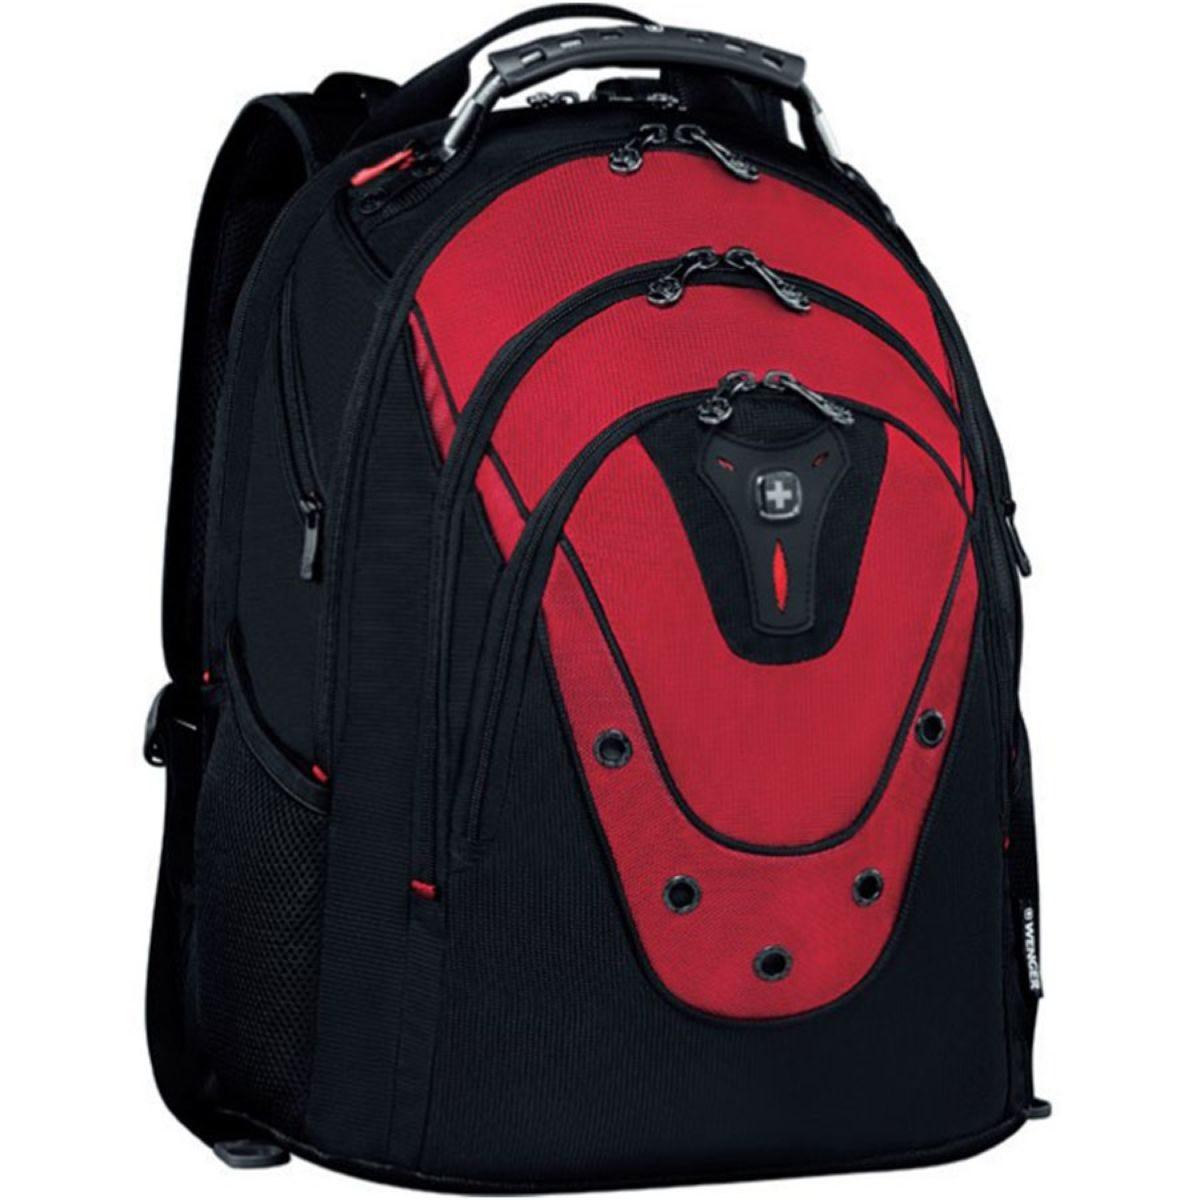 Wenger Ibex Backpack - 17